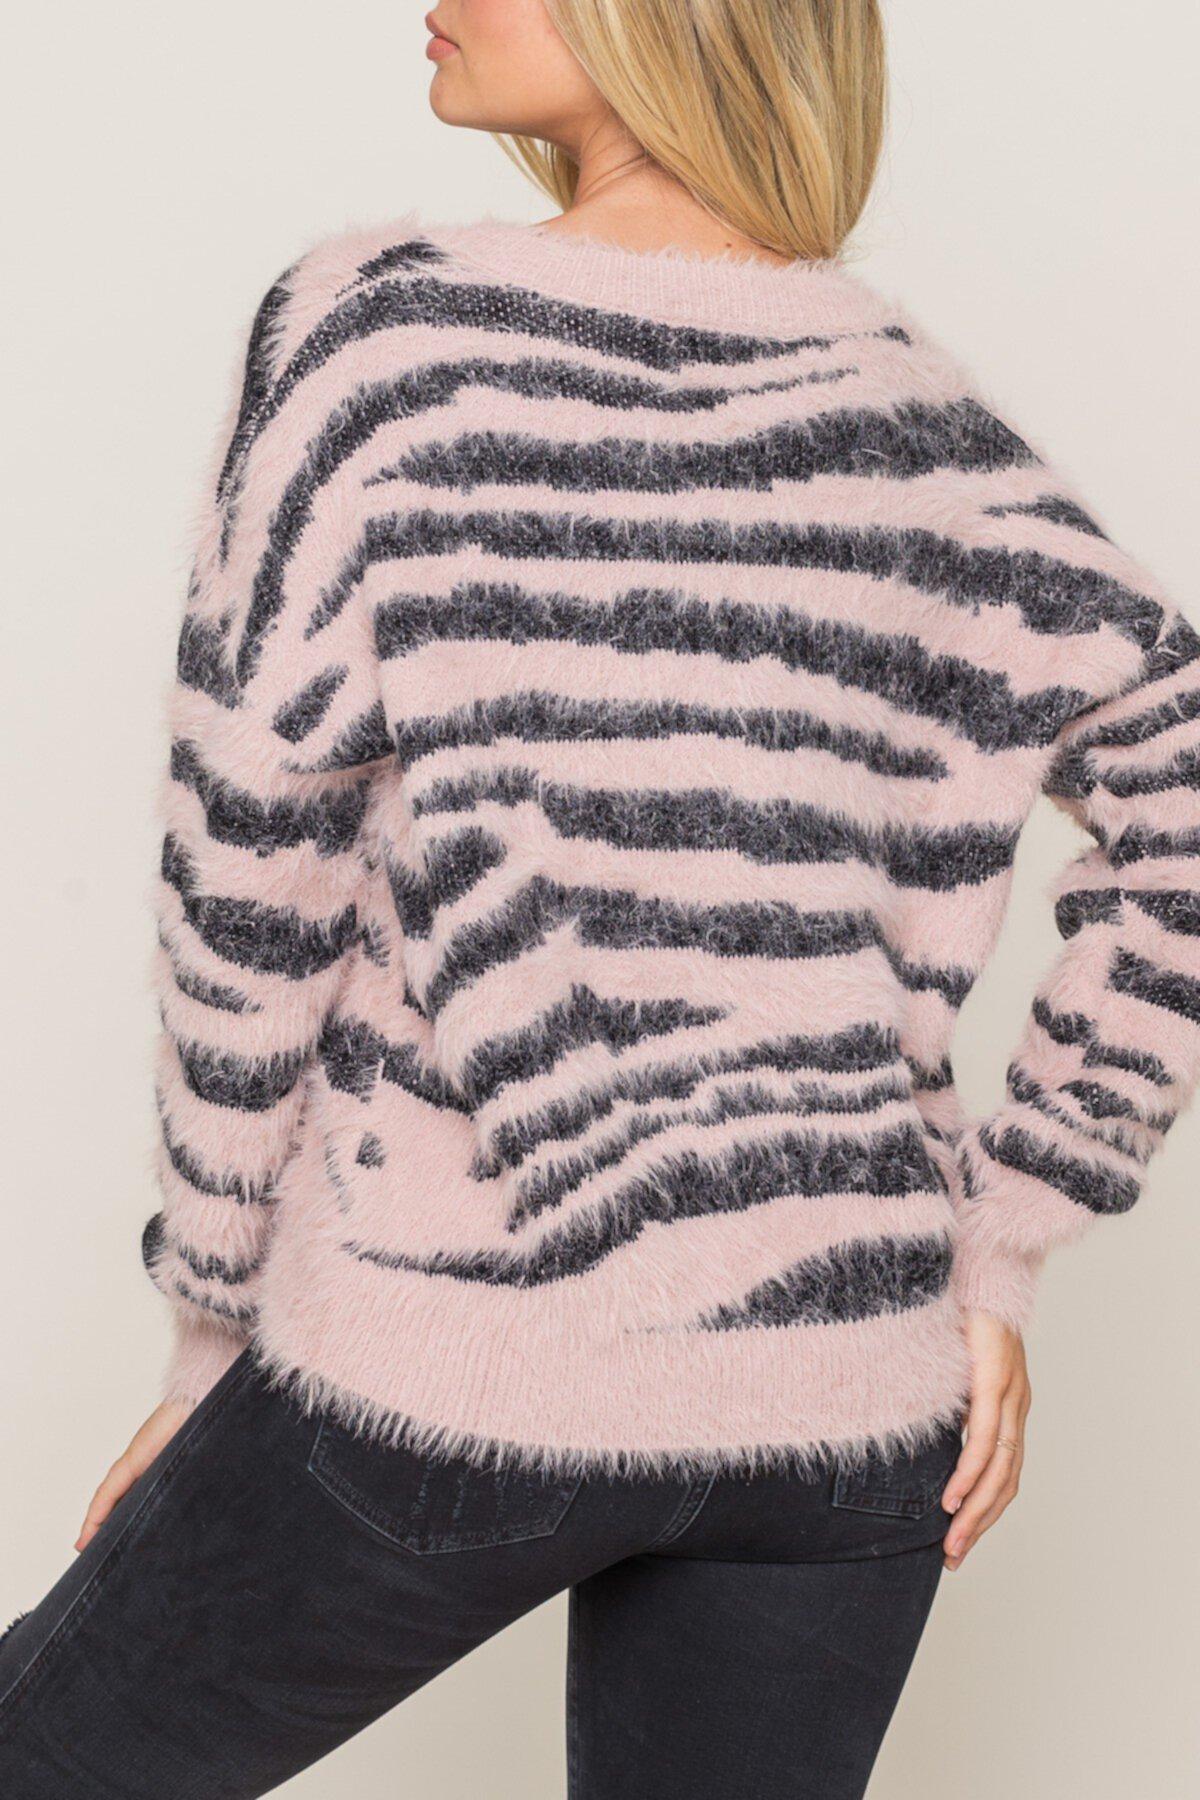 Свитер с полосатым принтом Fuzzy Zebra Lush